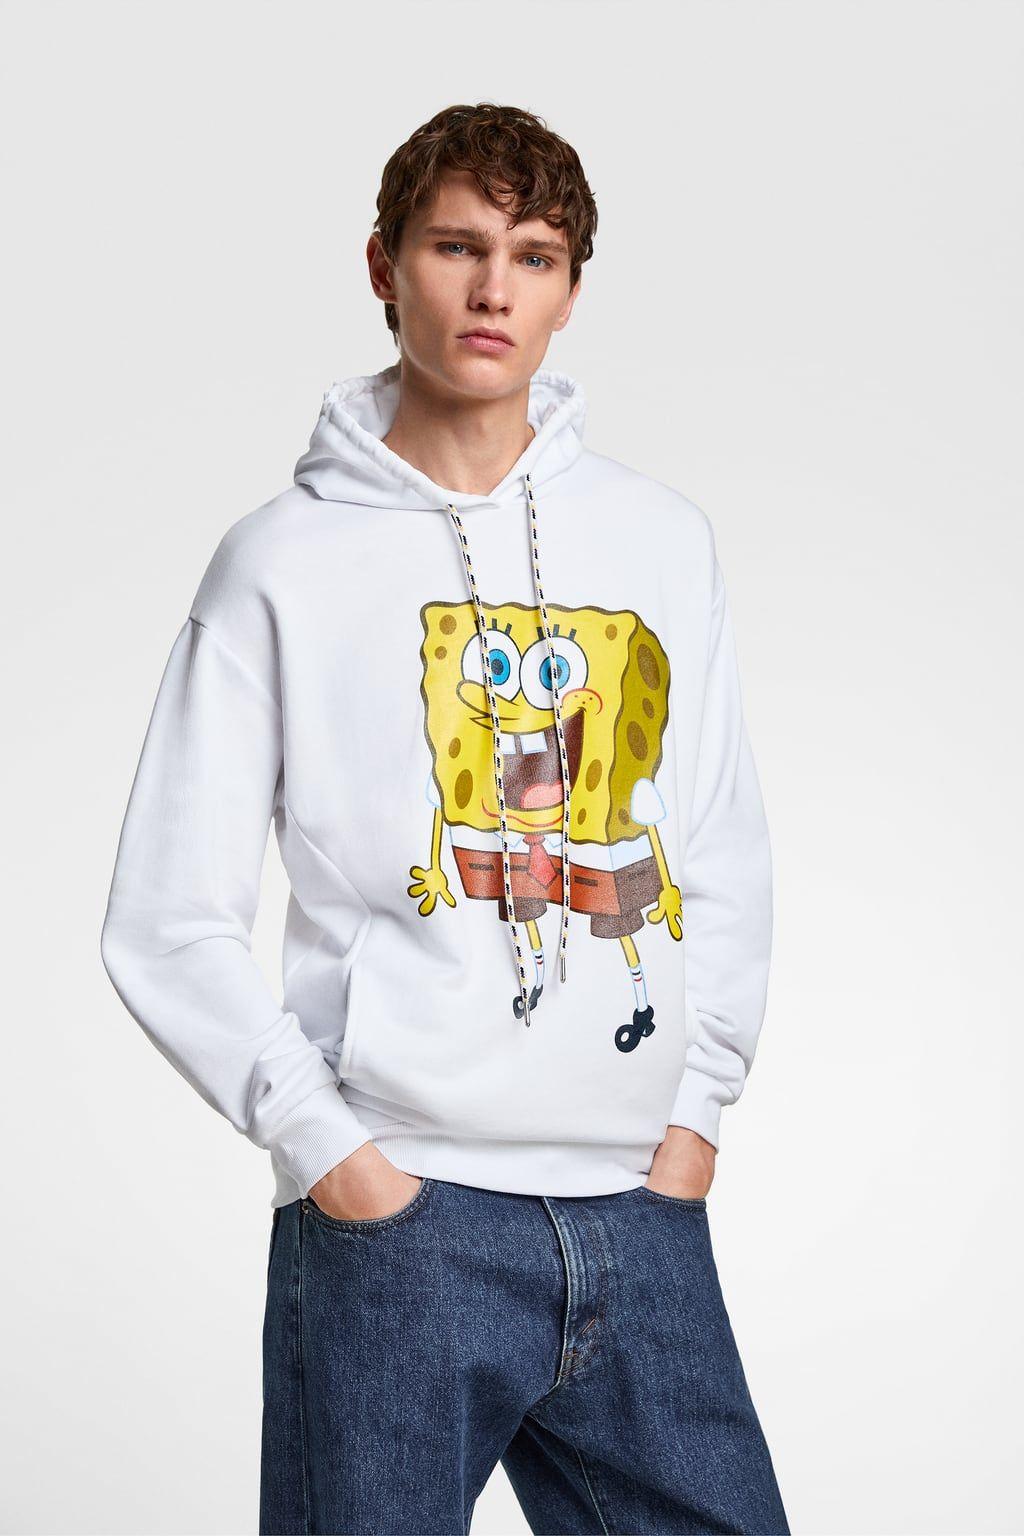 Sudadera Bob Esponja C Nickelodeon Sweatshirt Hoodie Sweatshirts Kapuzenpullover